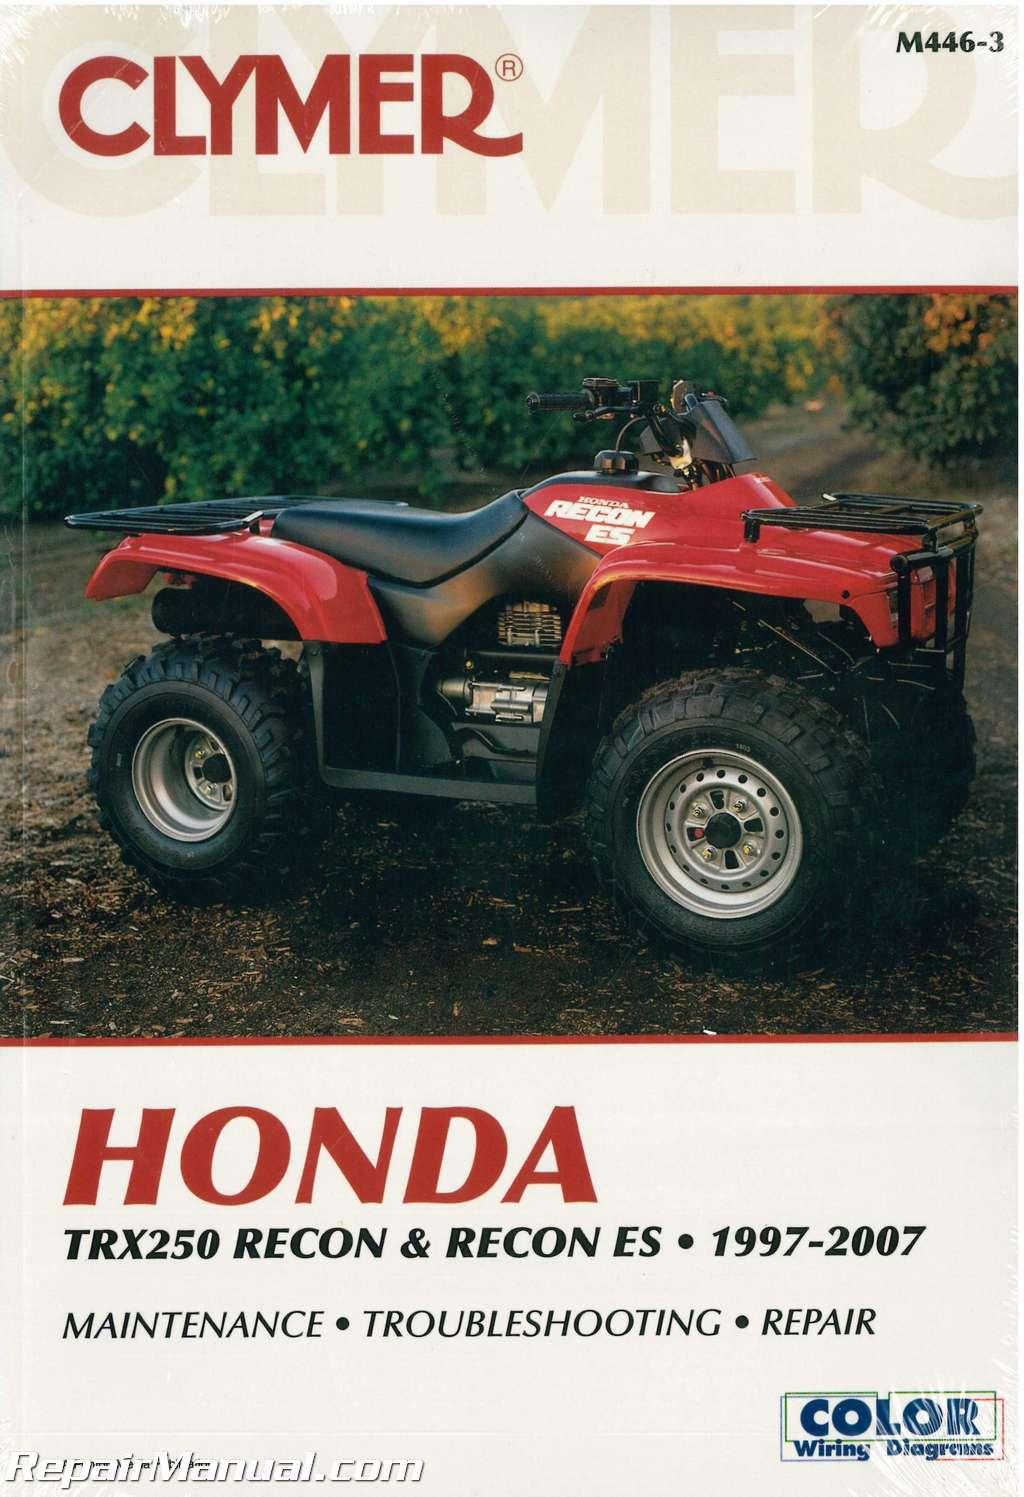 Honda Recon For Sale >> 1997-2007 Honda TRX250 Recon ES ATV Repair Manual by Clymer